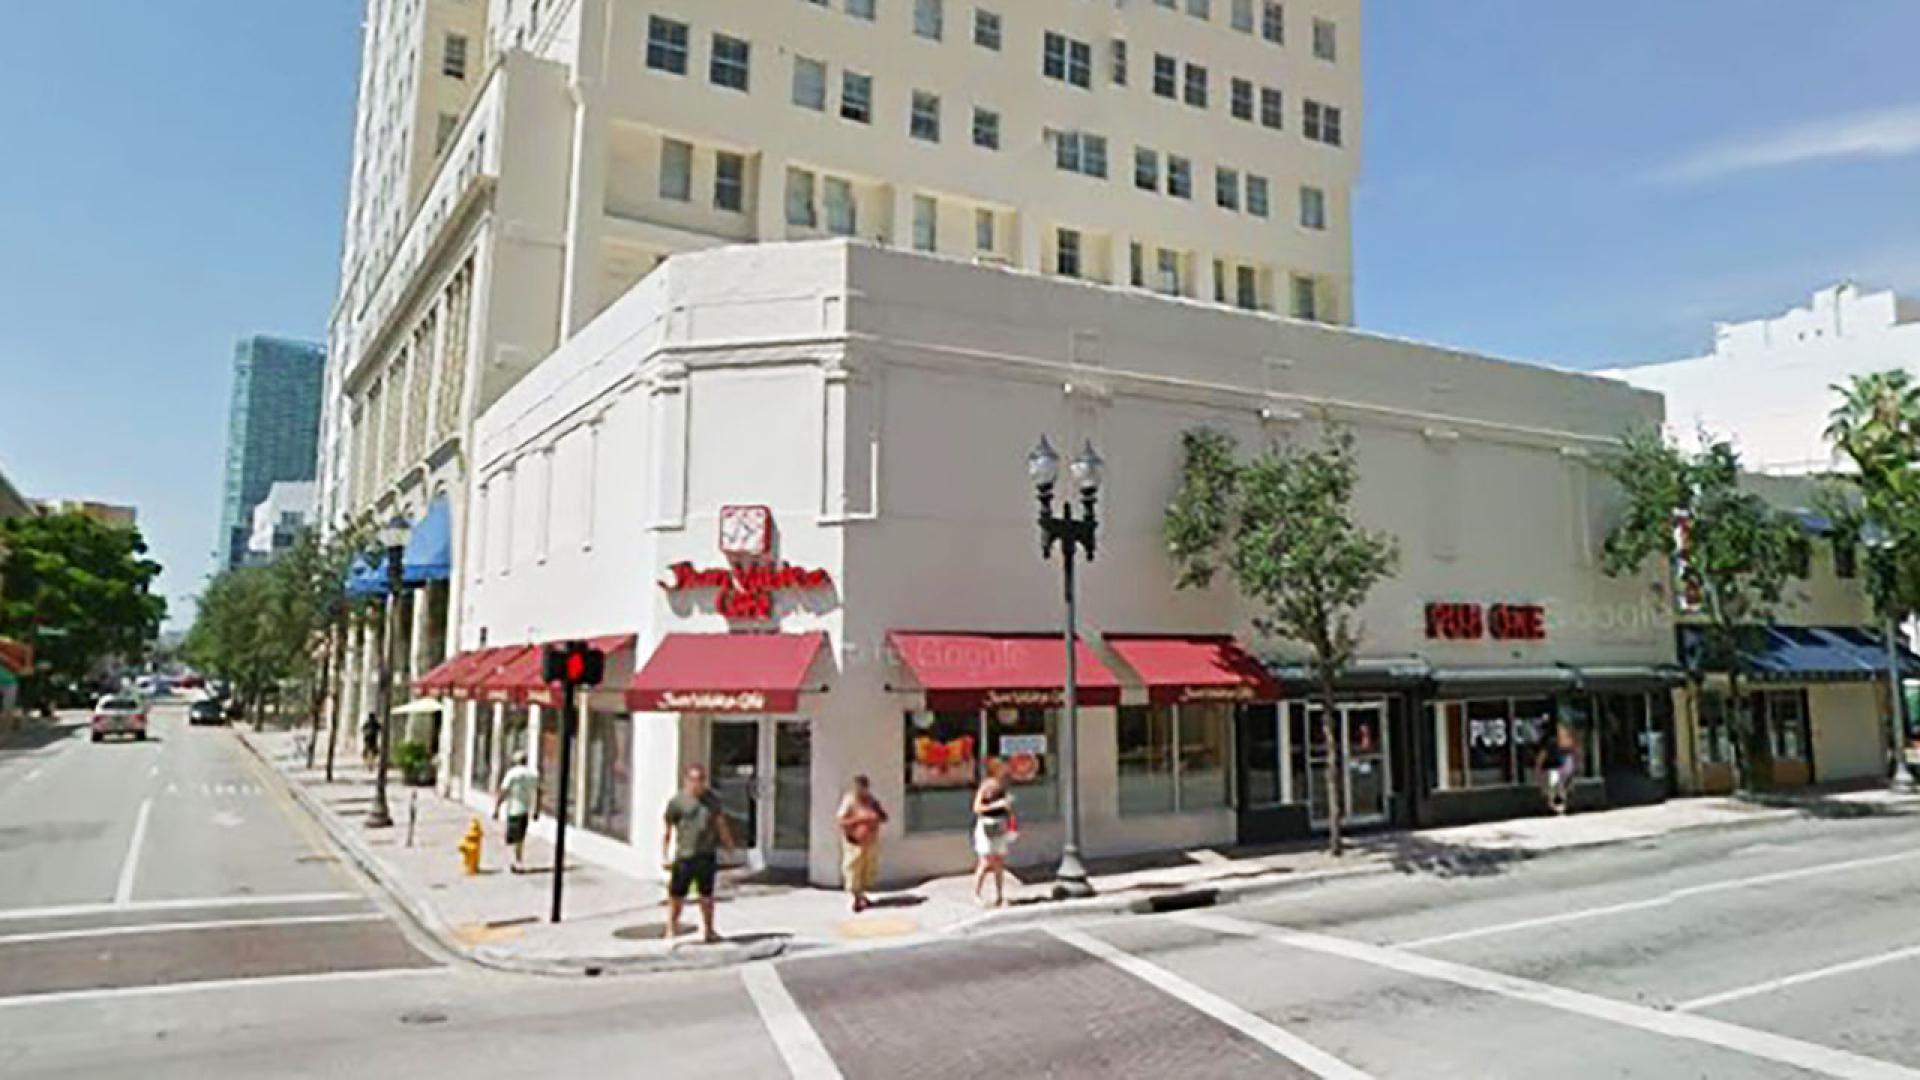 101 NE 2nd Ave - Downtown Miami